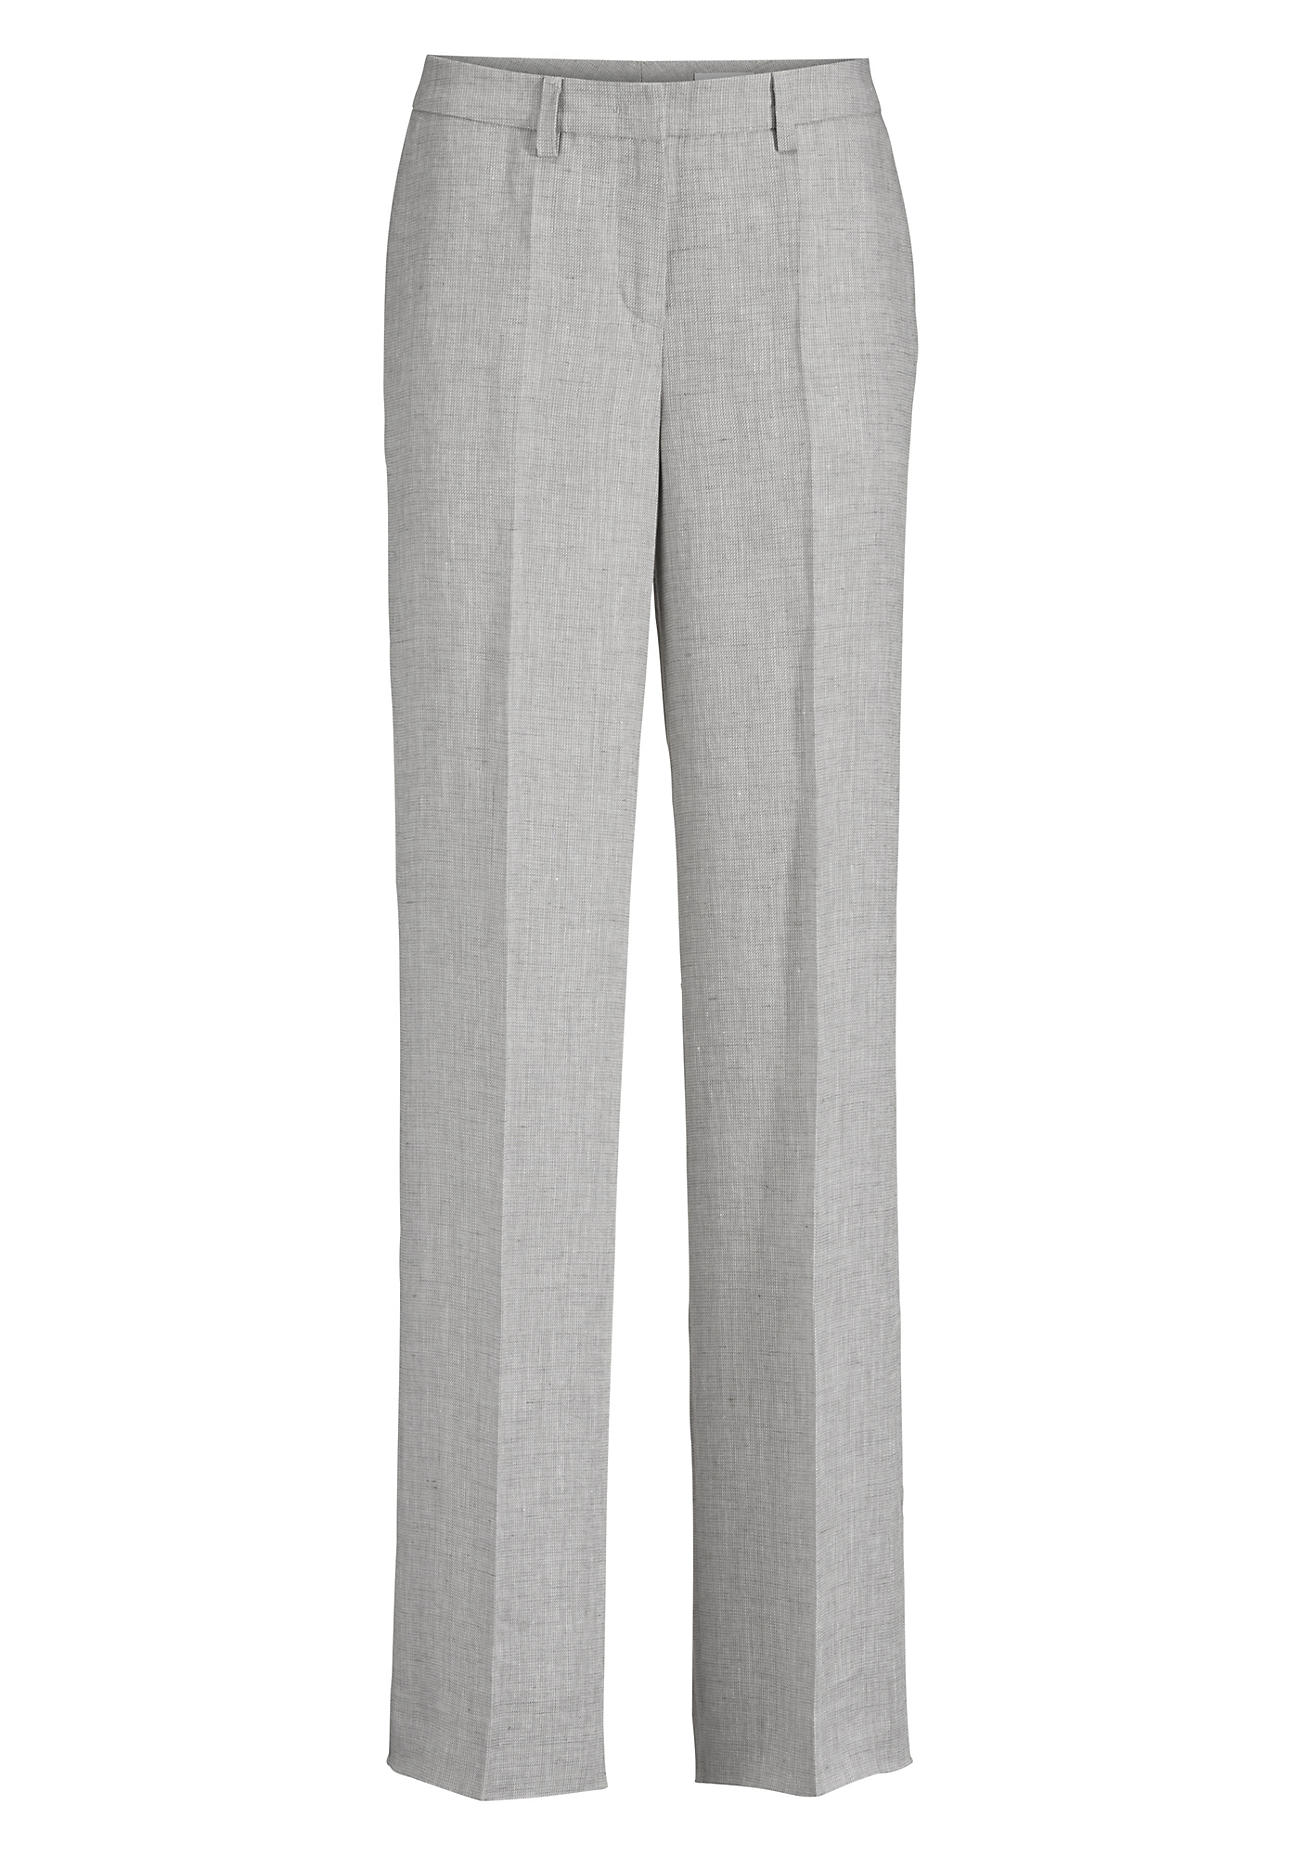 Hosen für Frauen - hessnatur Damen Hose aus Leinen – grau –  - Onlineshop Hessnatur